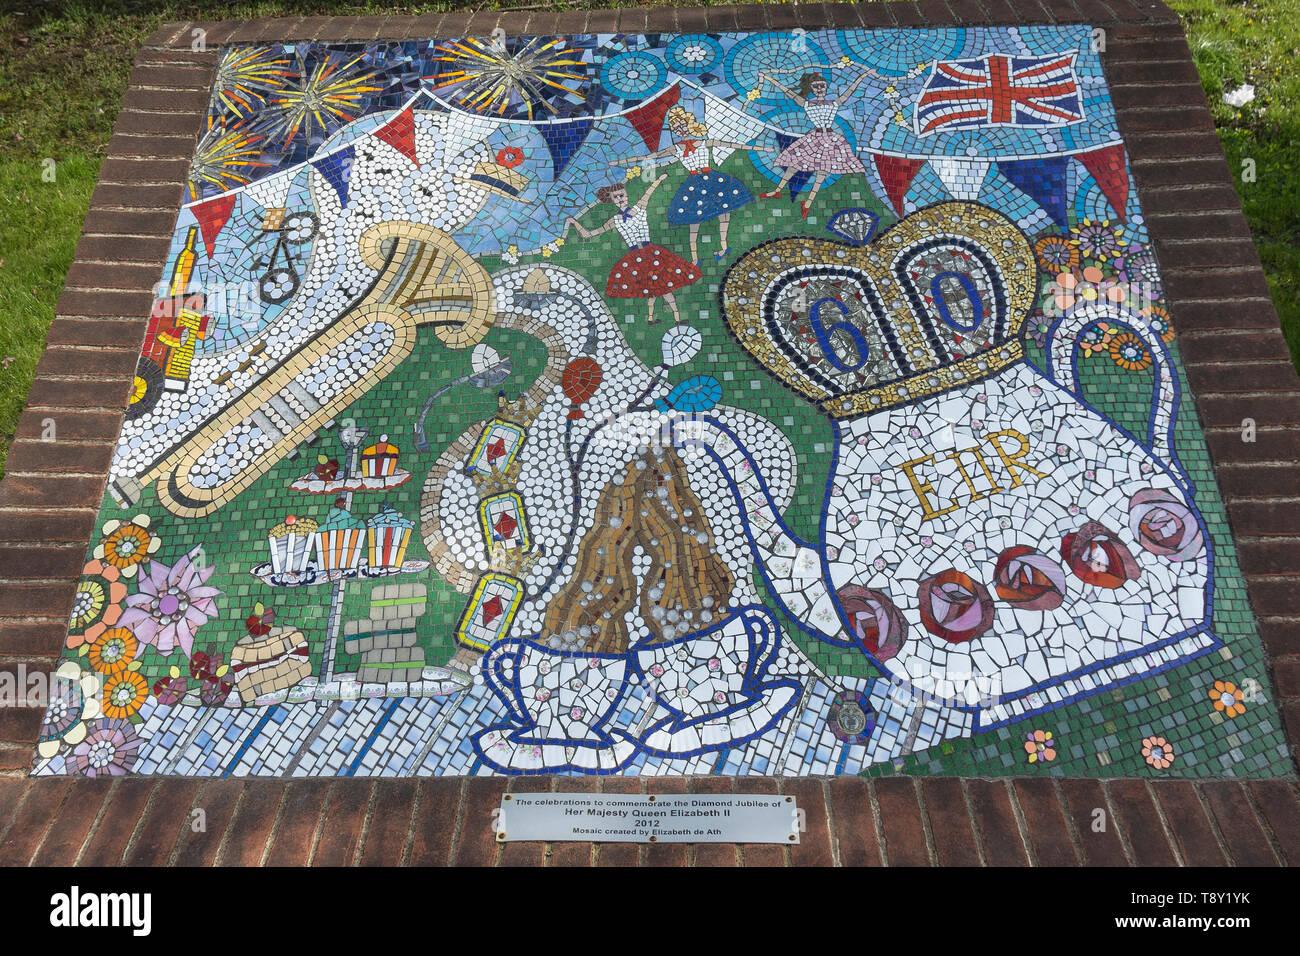 England, Hampshire, Rowlands castle, 2012 Diamond Jubilee mosaic - Stock Image